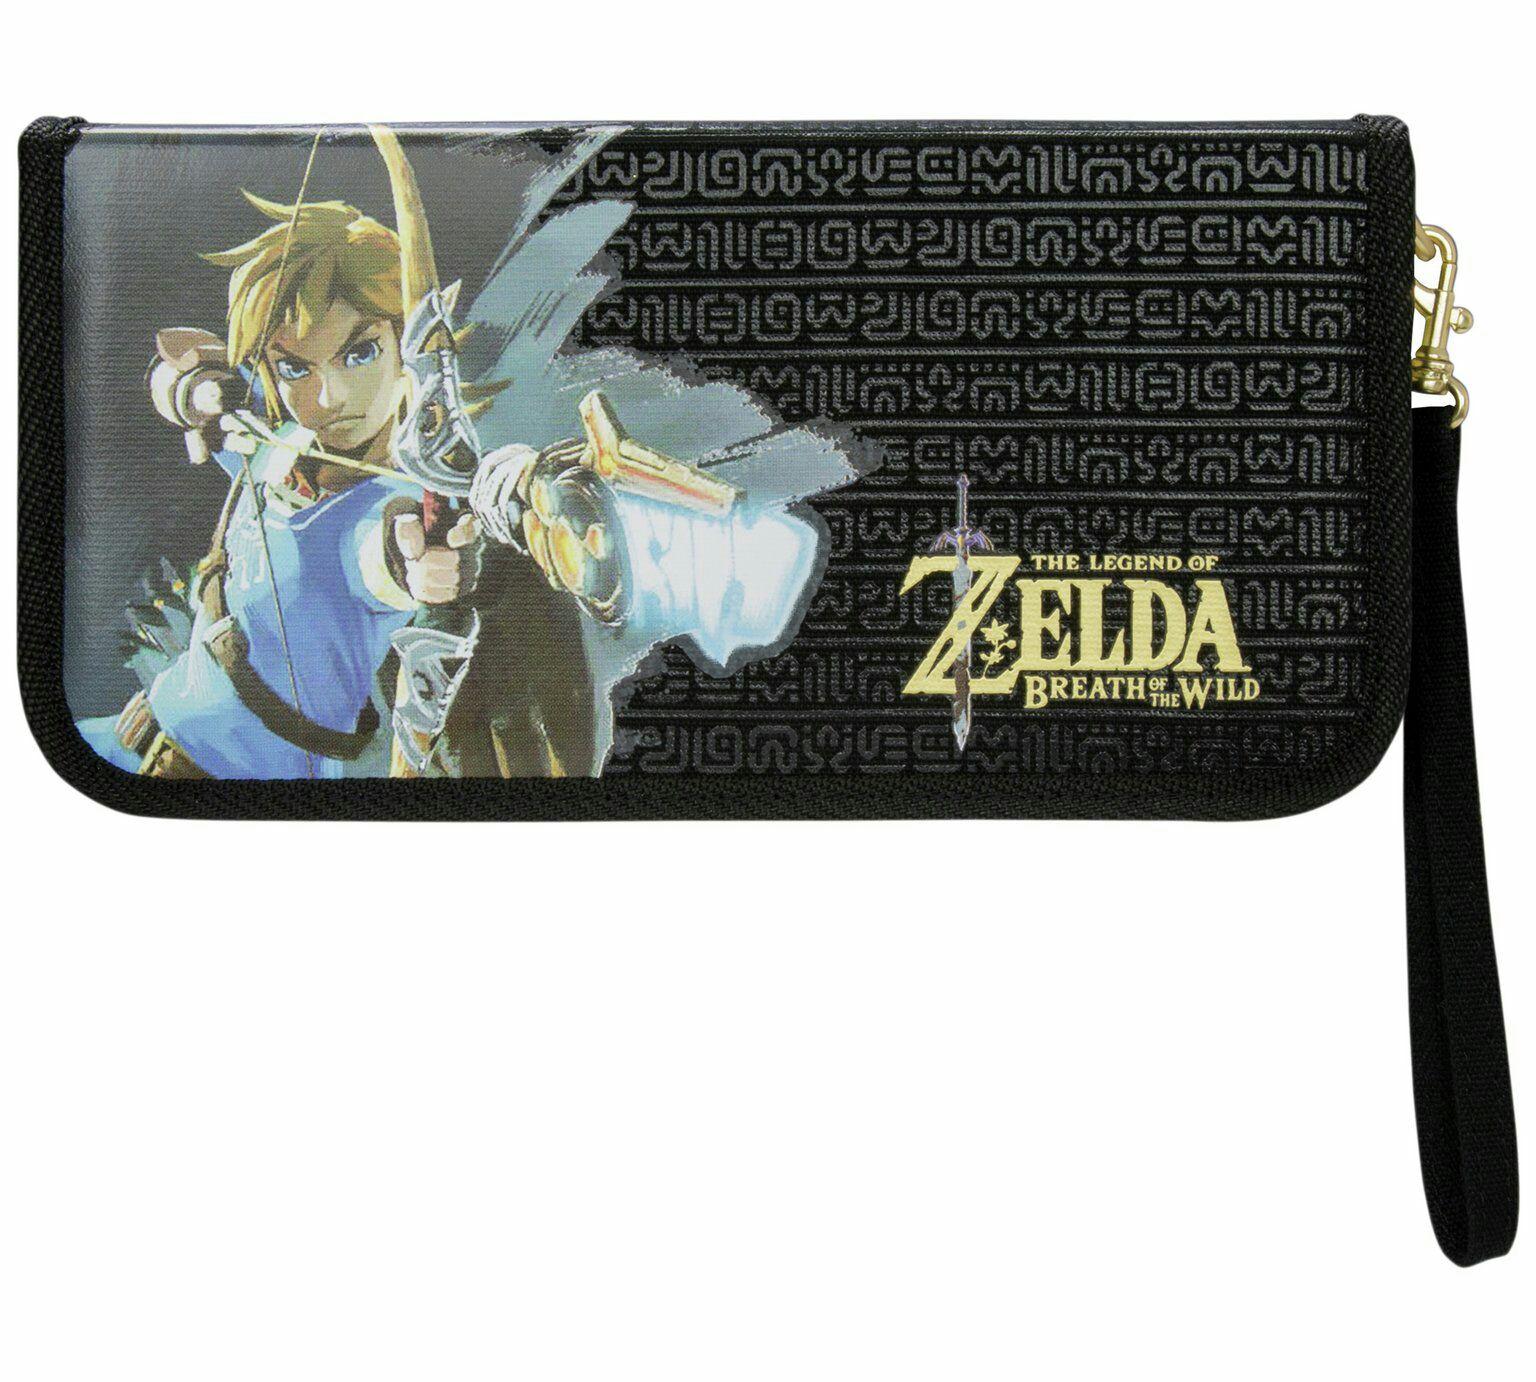 Nintendo Switch Zelda Zipper Case £9.99 @ argos